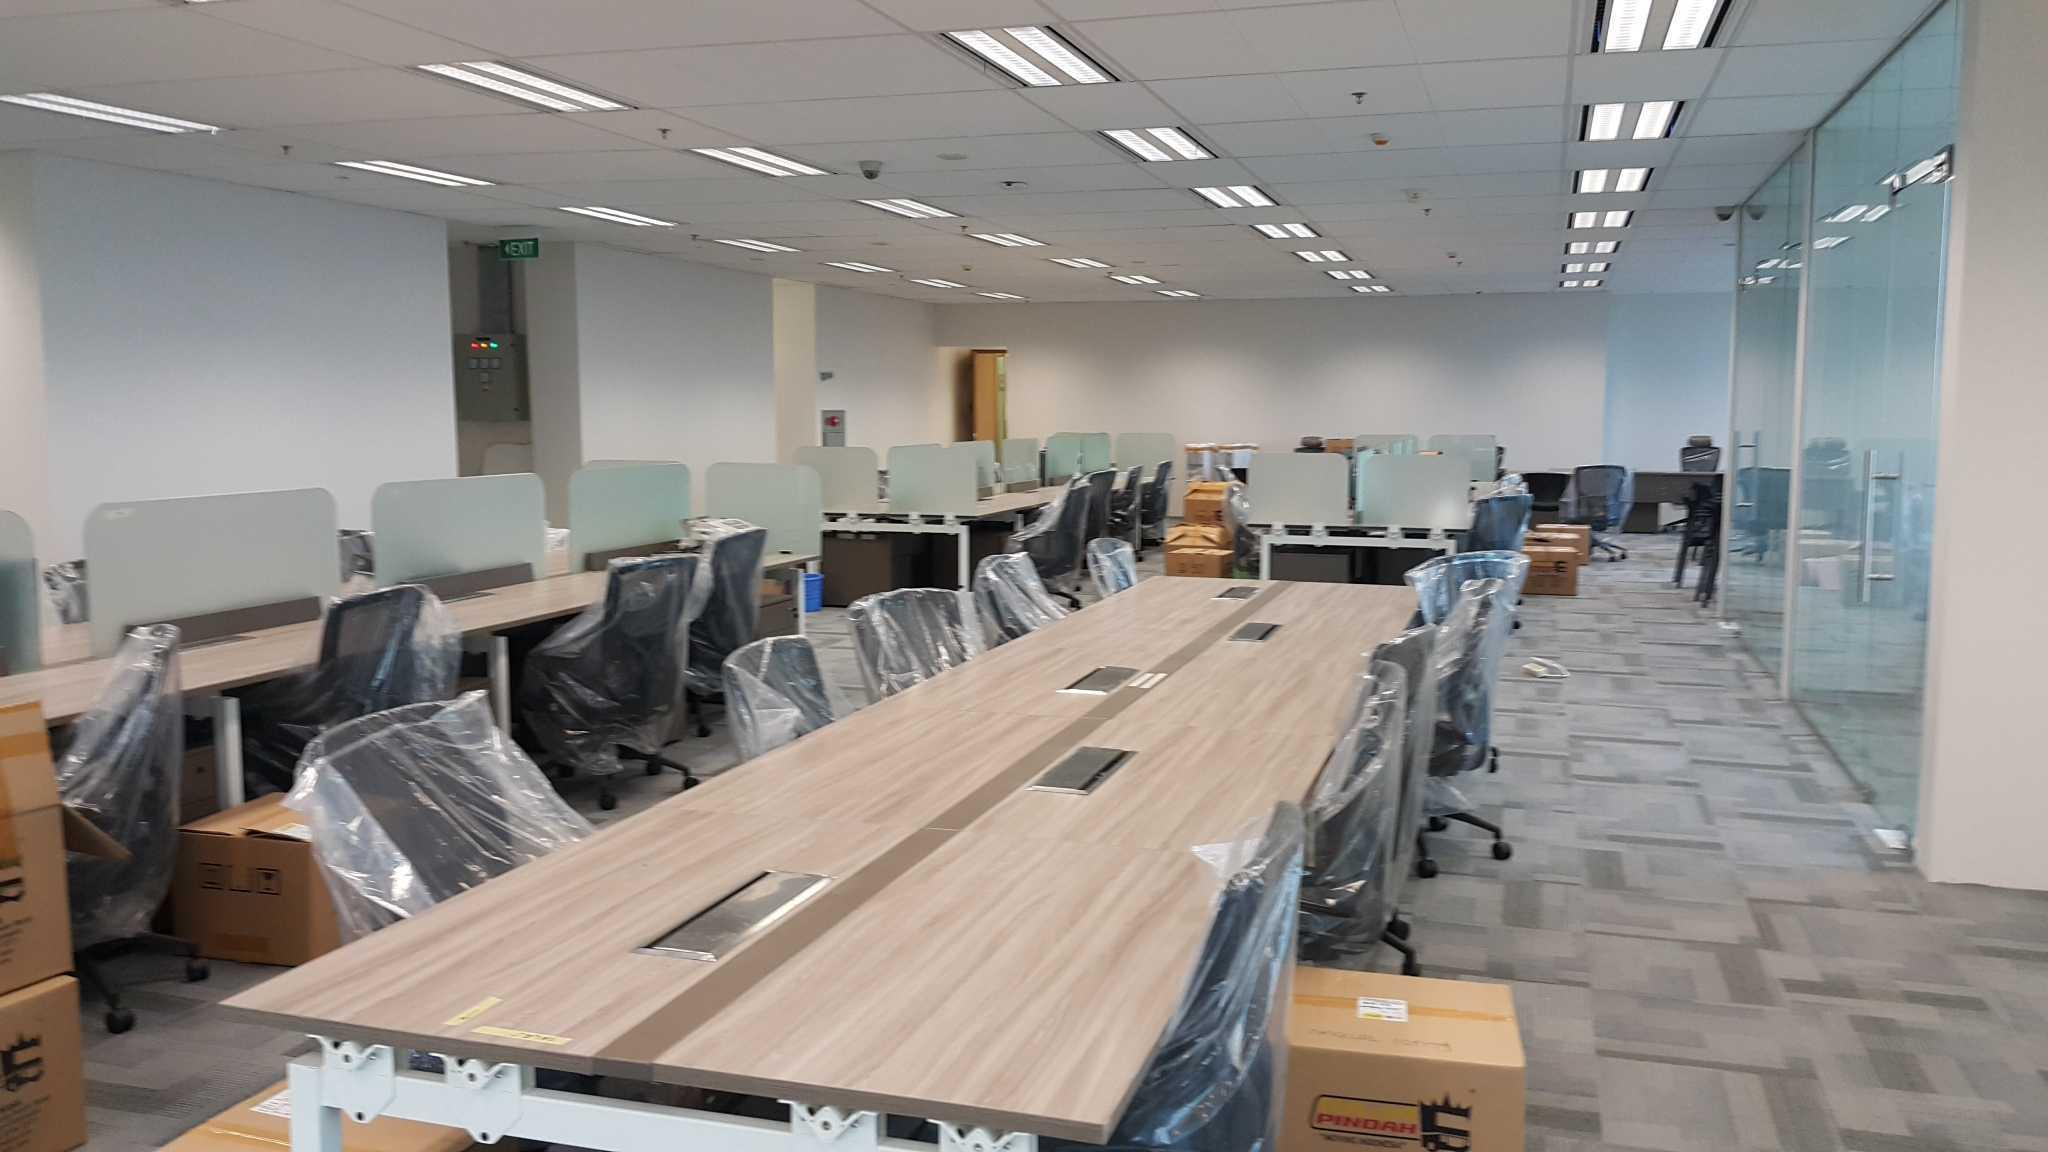 Arsindo Cipta Karya Pt Boral Jayaboard Jakarta Jakarta Working Area Minimalis  26134